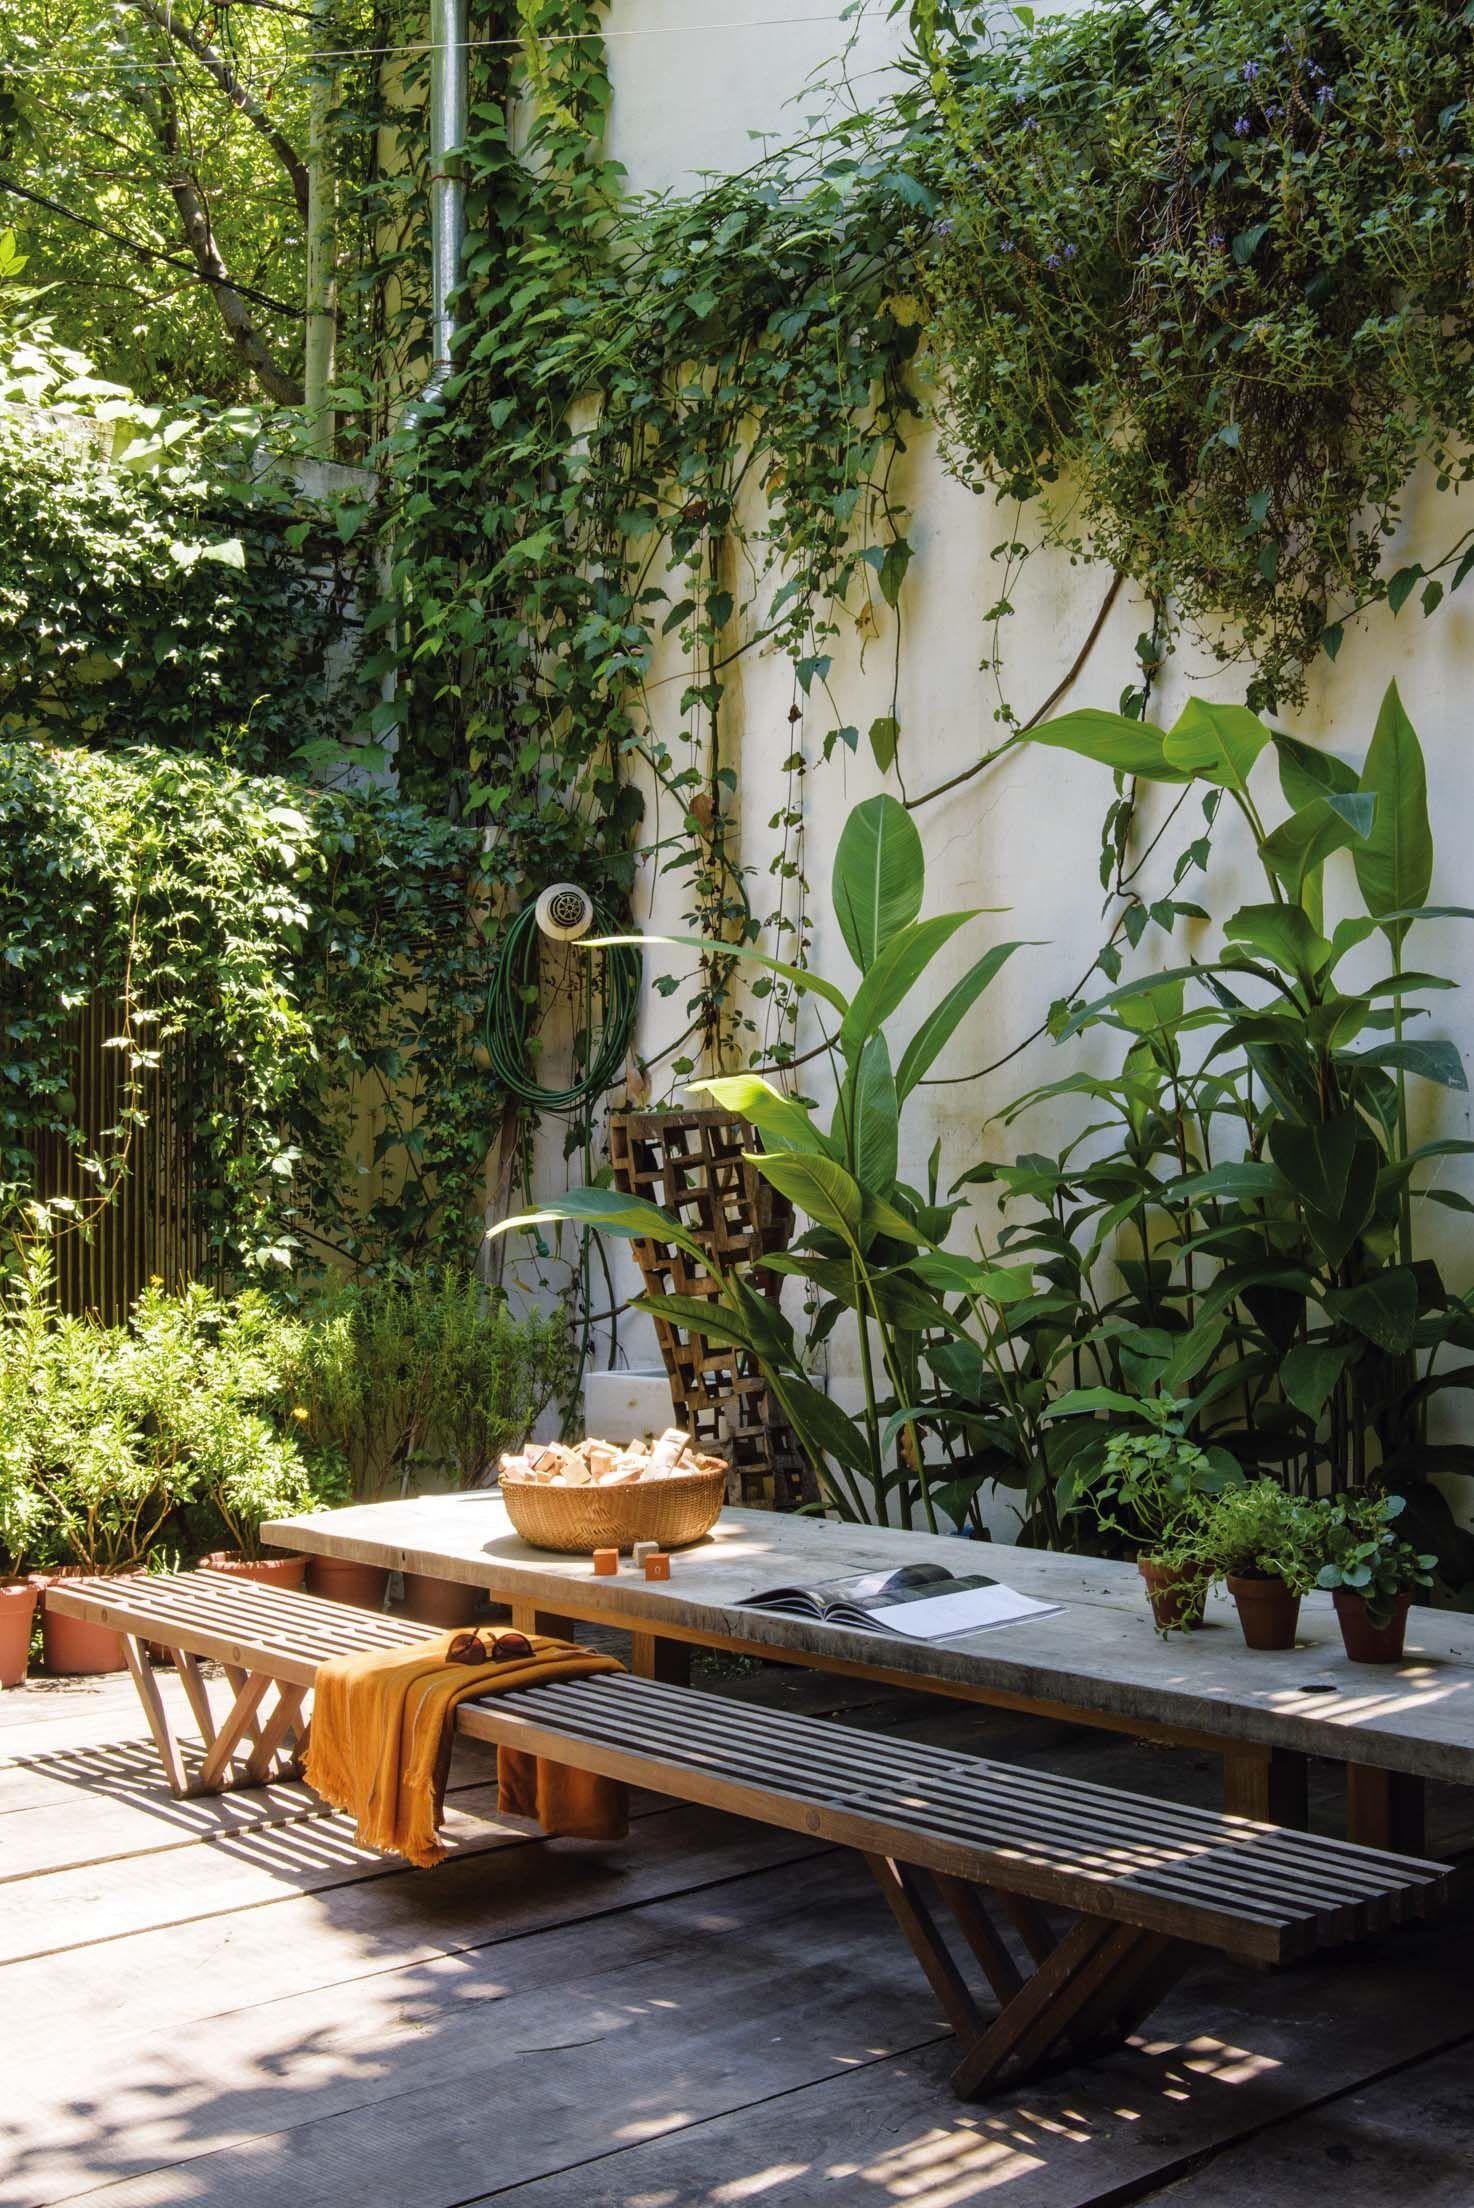 20 ideas para crear tu selva urbana con pocos metros - Estanque terraza piso ...